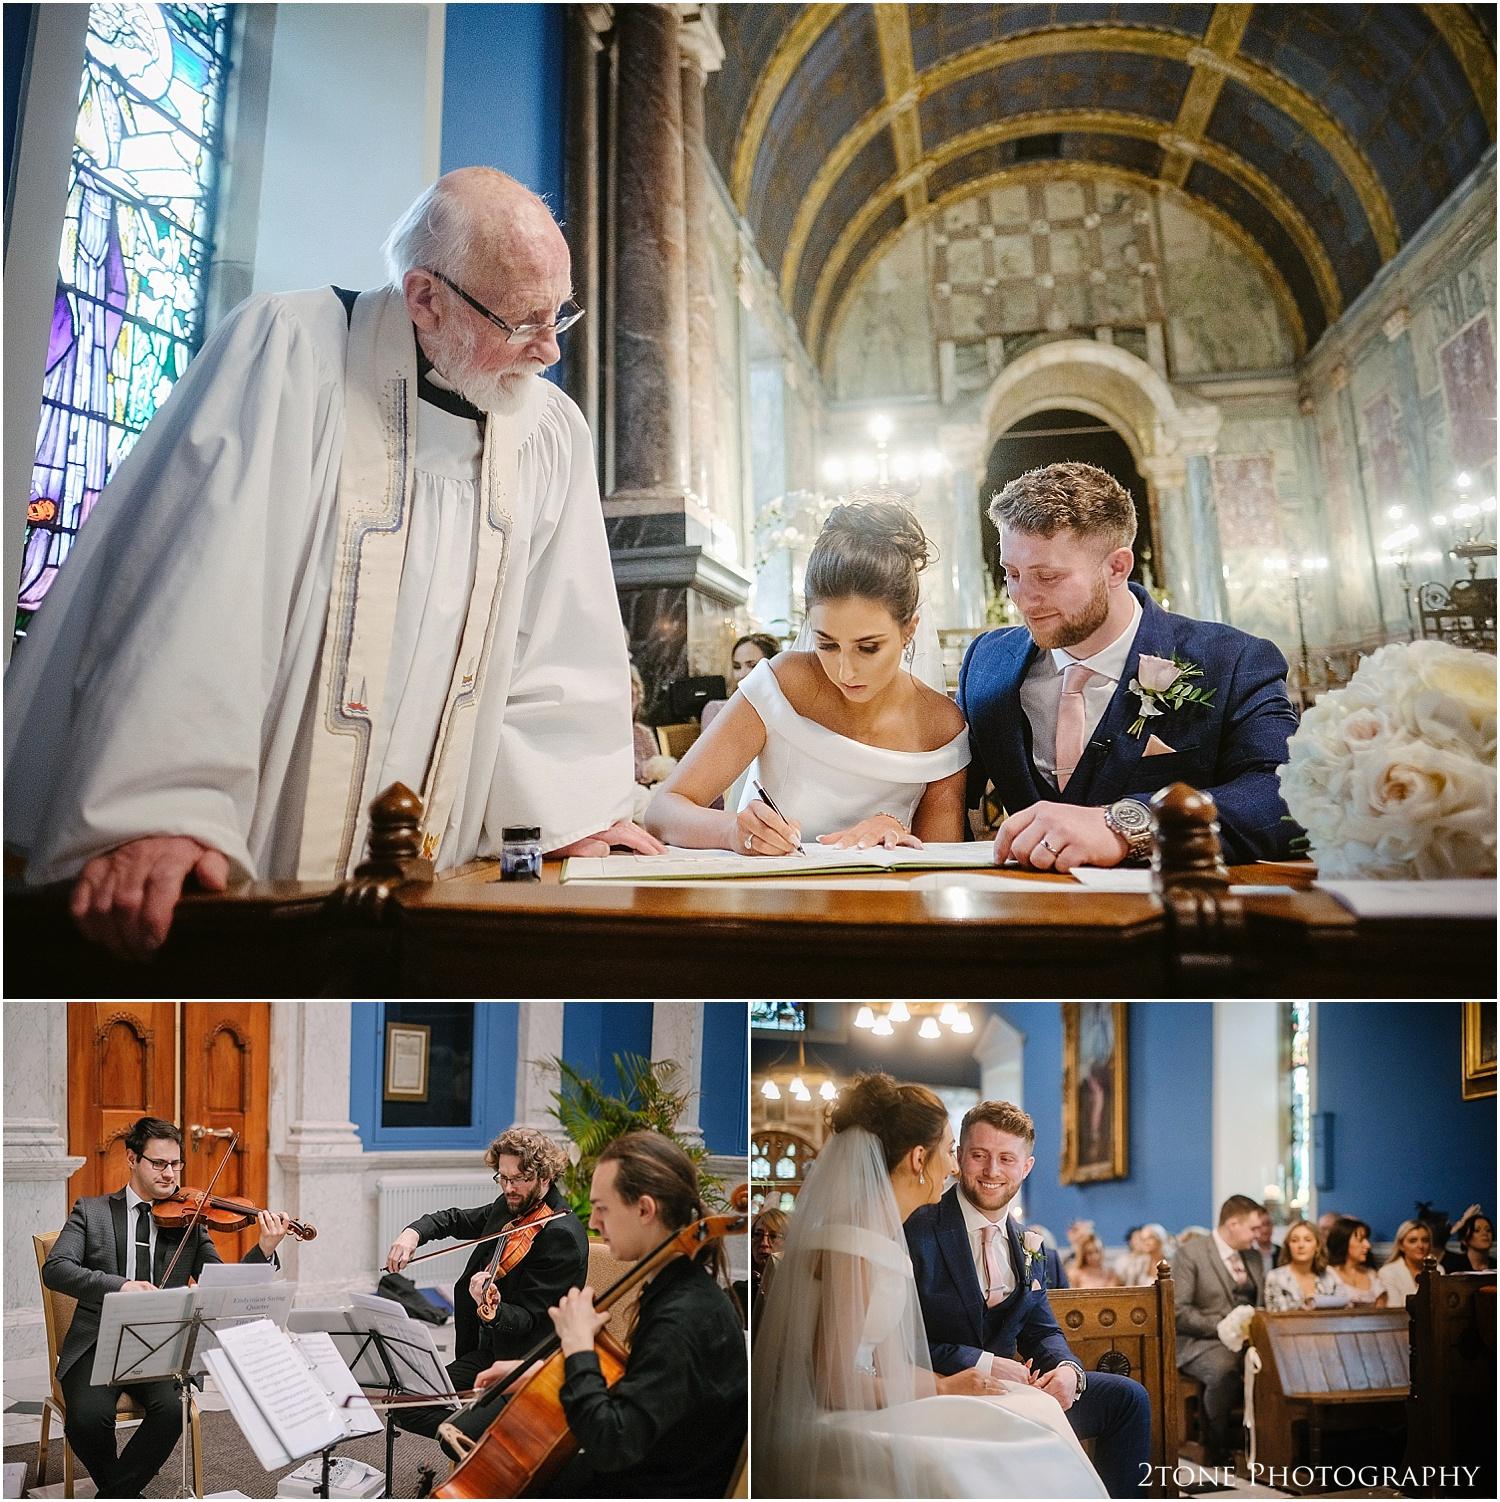 Wynyard Hall wedding photographer 039.jpg